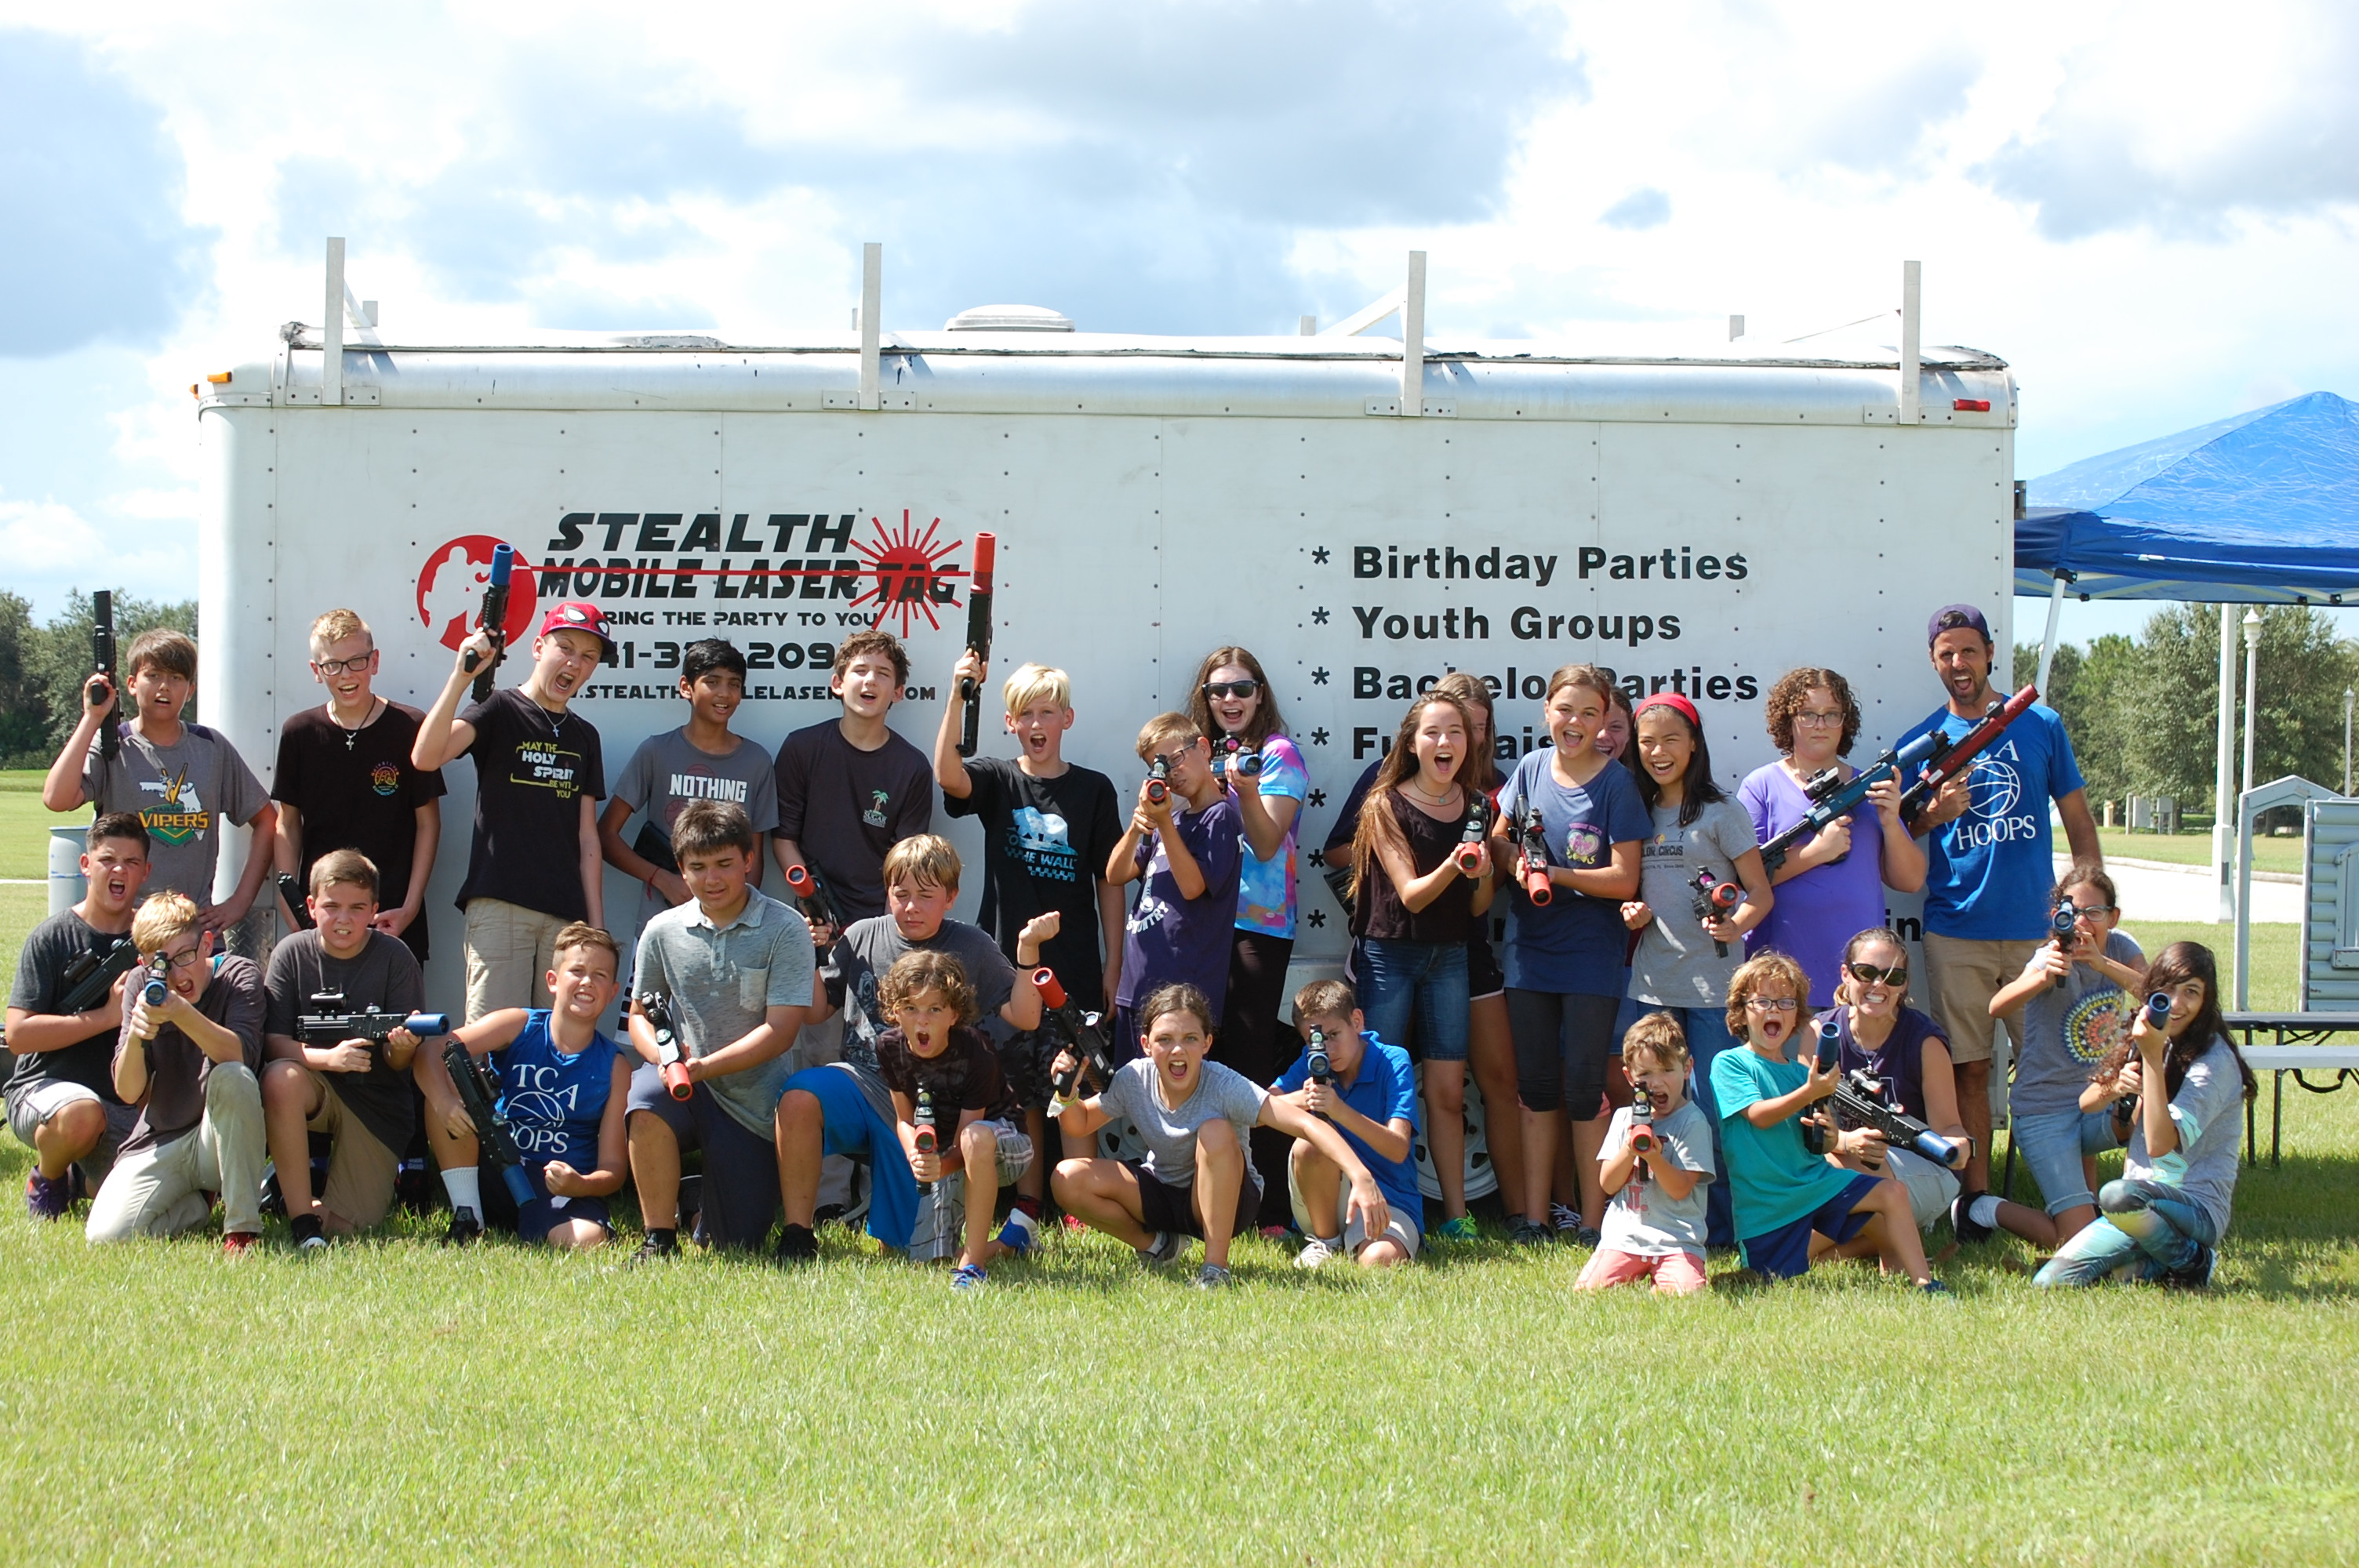 Back to School Events in Sarasota, FL